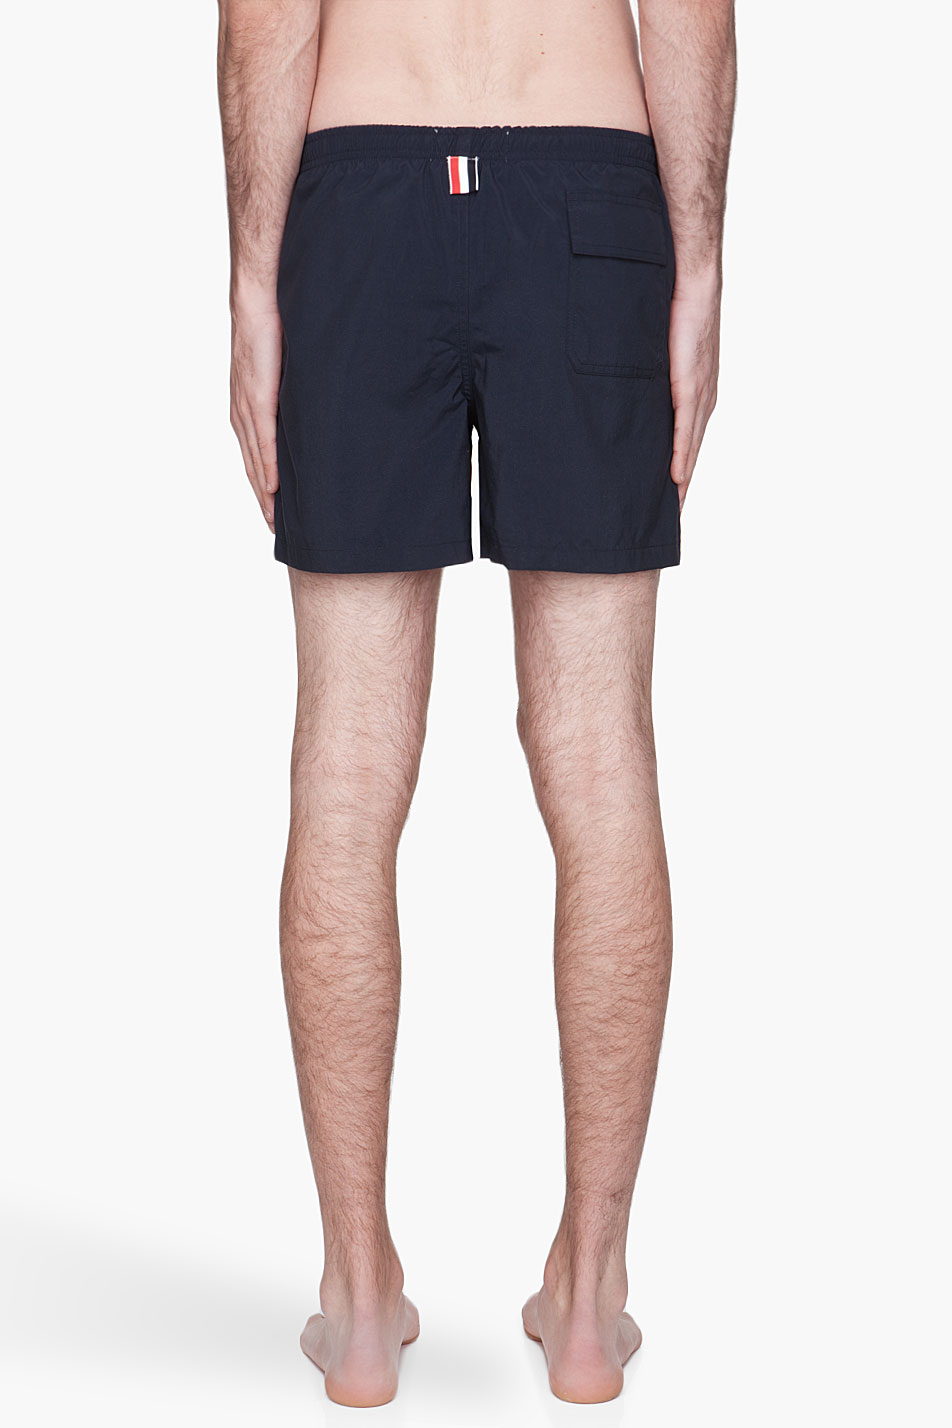 a95e0d57f9 Thom Browne Nylon Taffeta Swin Shorts in Blue for Men - Lyst